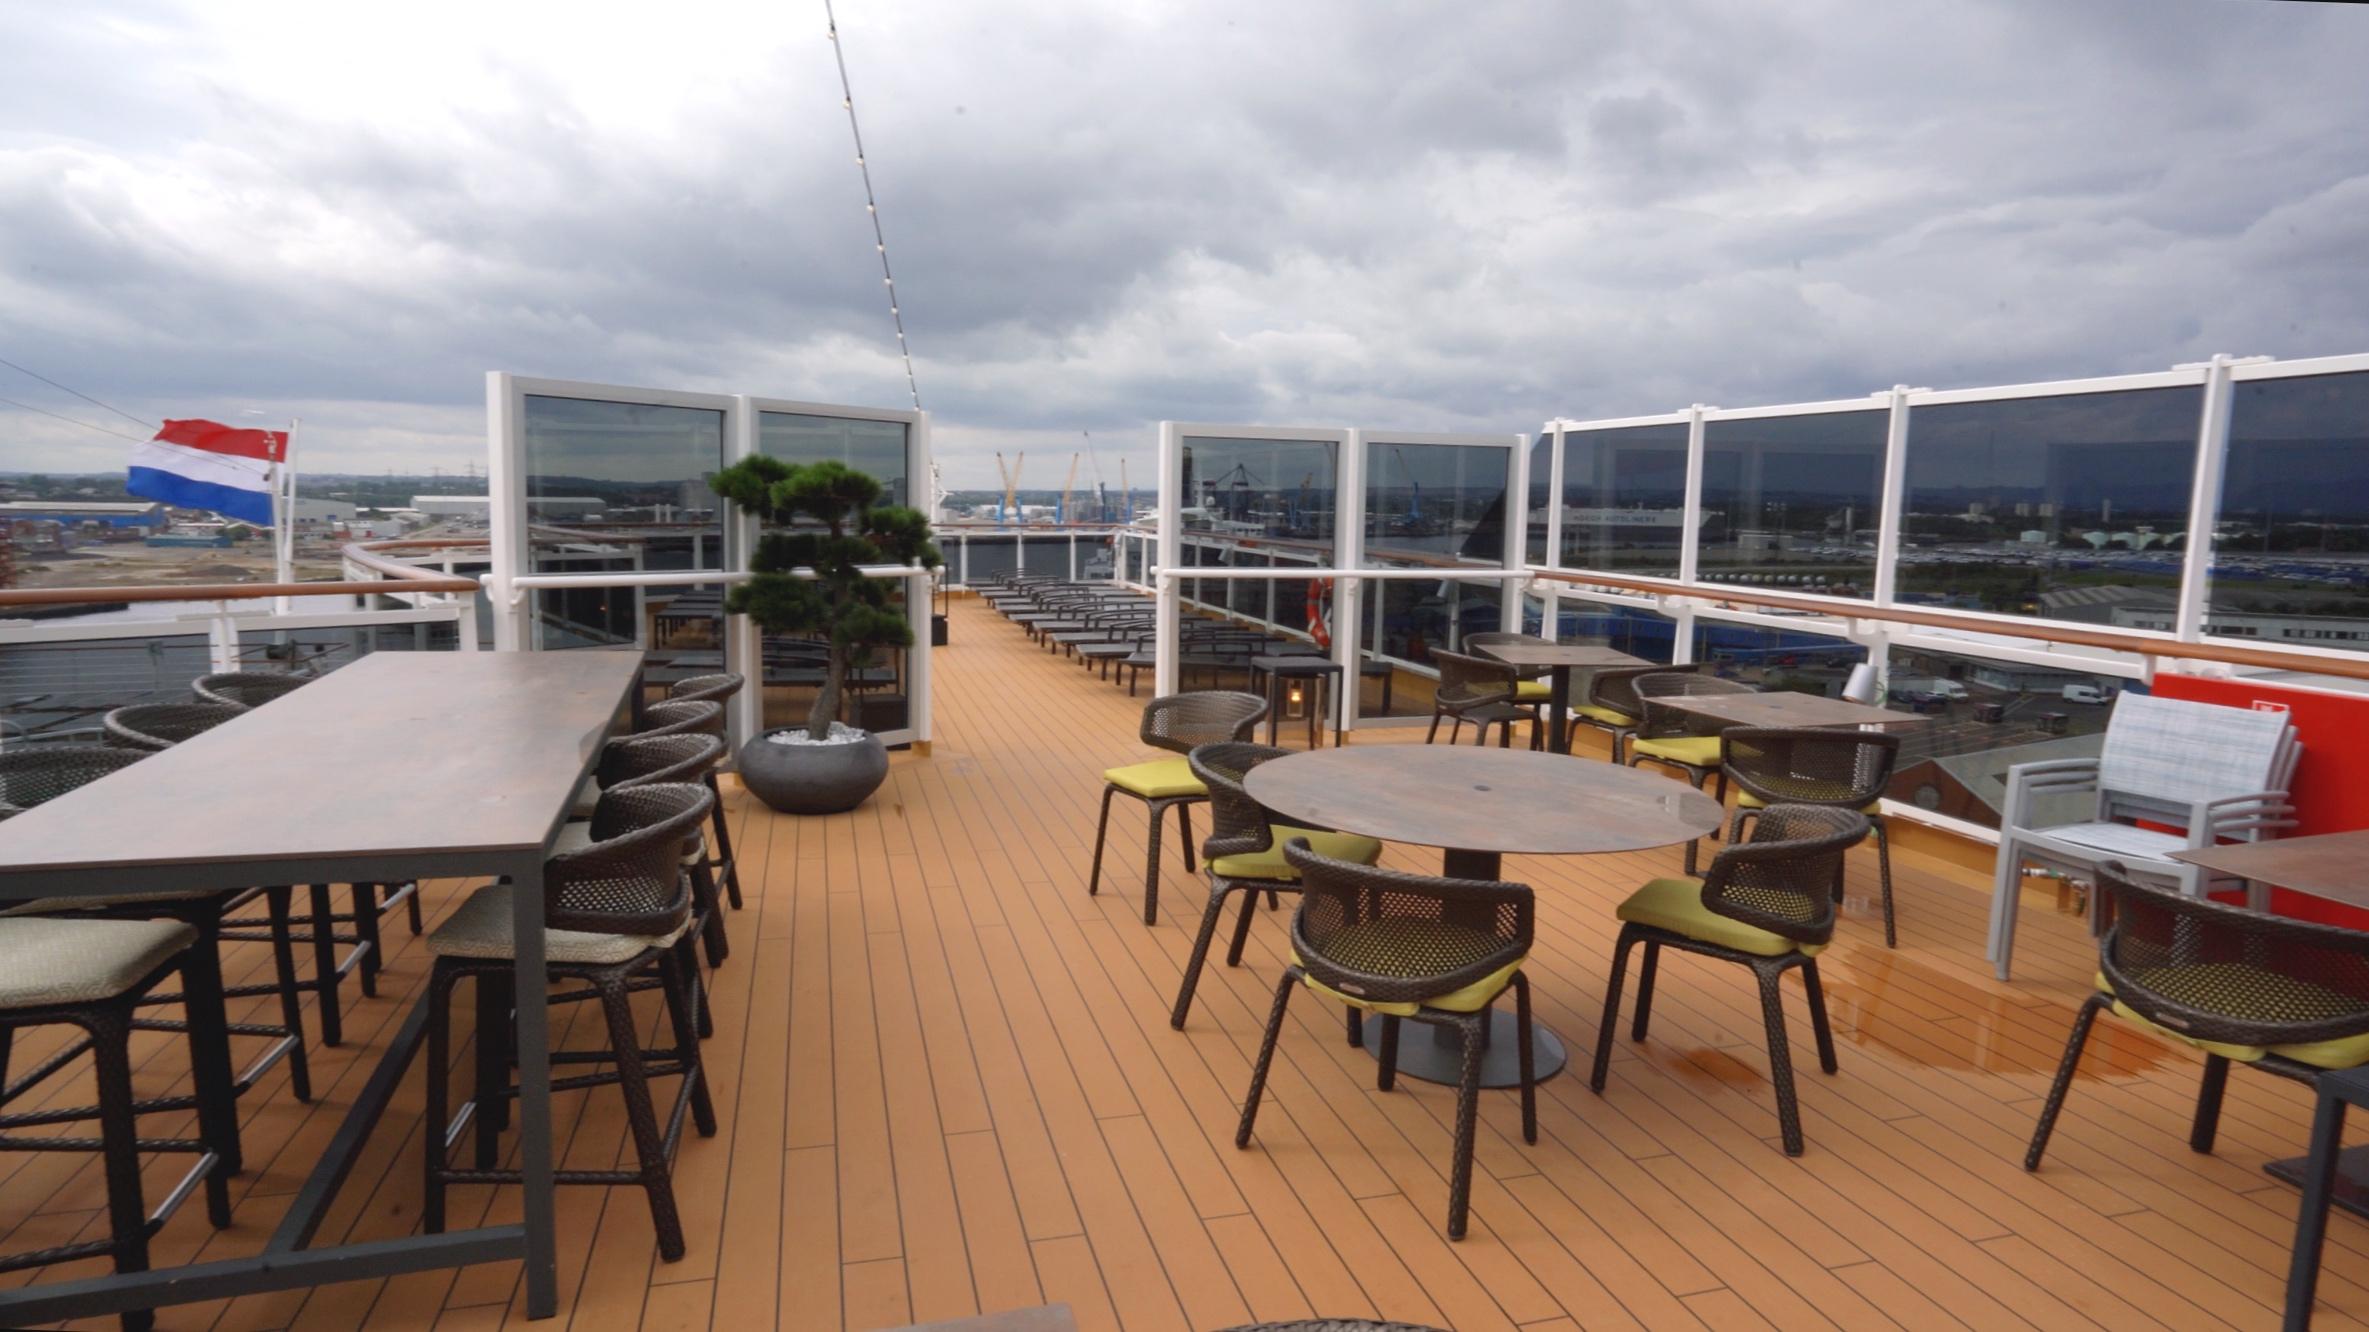 Tamarind outdoor seating area